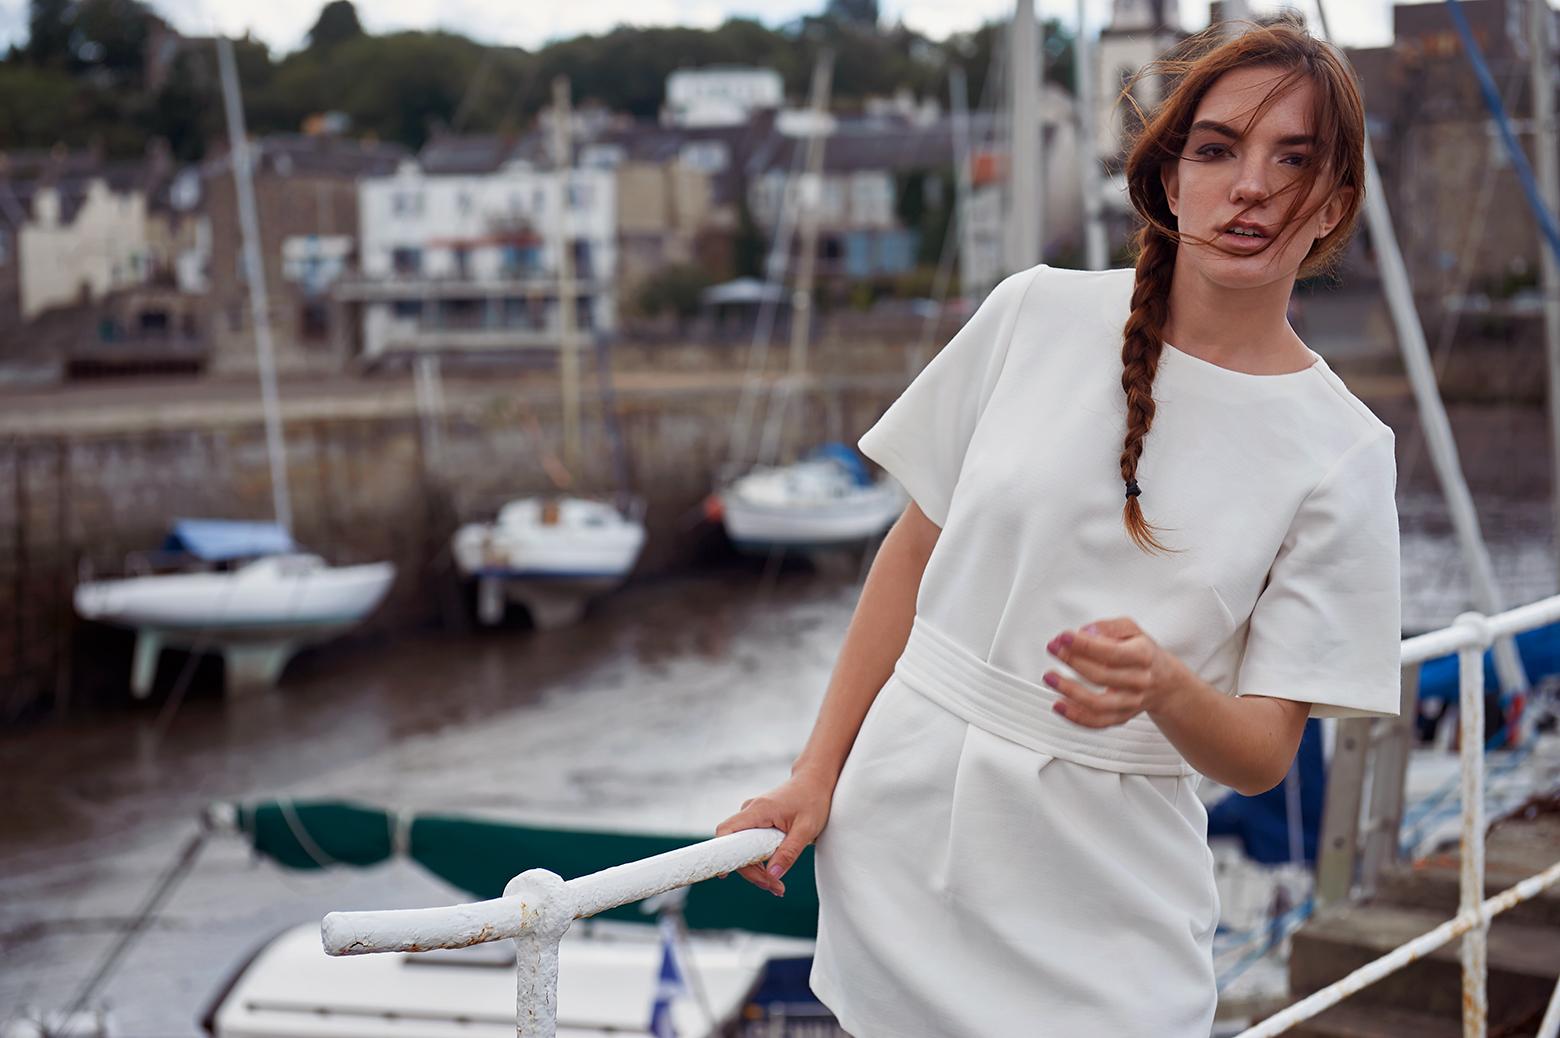 queensferry, edinburgh, scotland, travel, sea, bridge, forth bridge, my british summer, portraiture, photography, landscape, sea, ocean